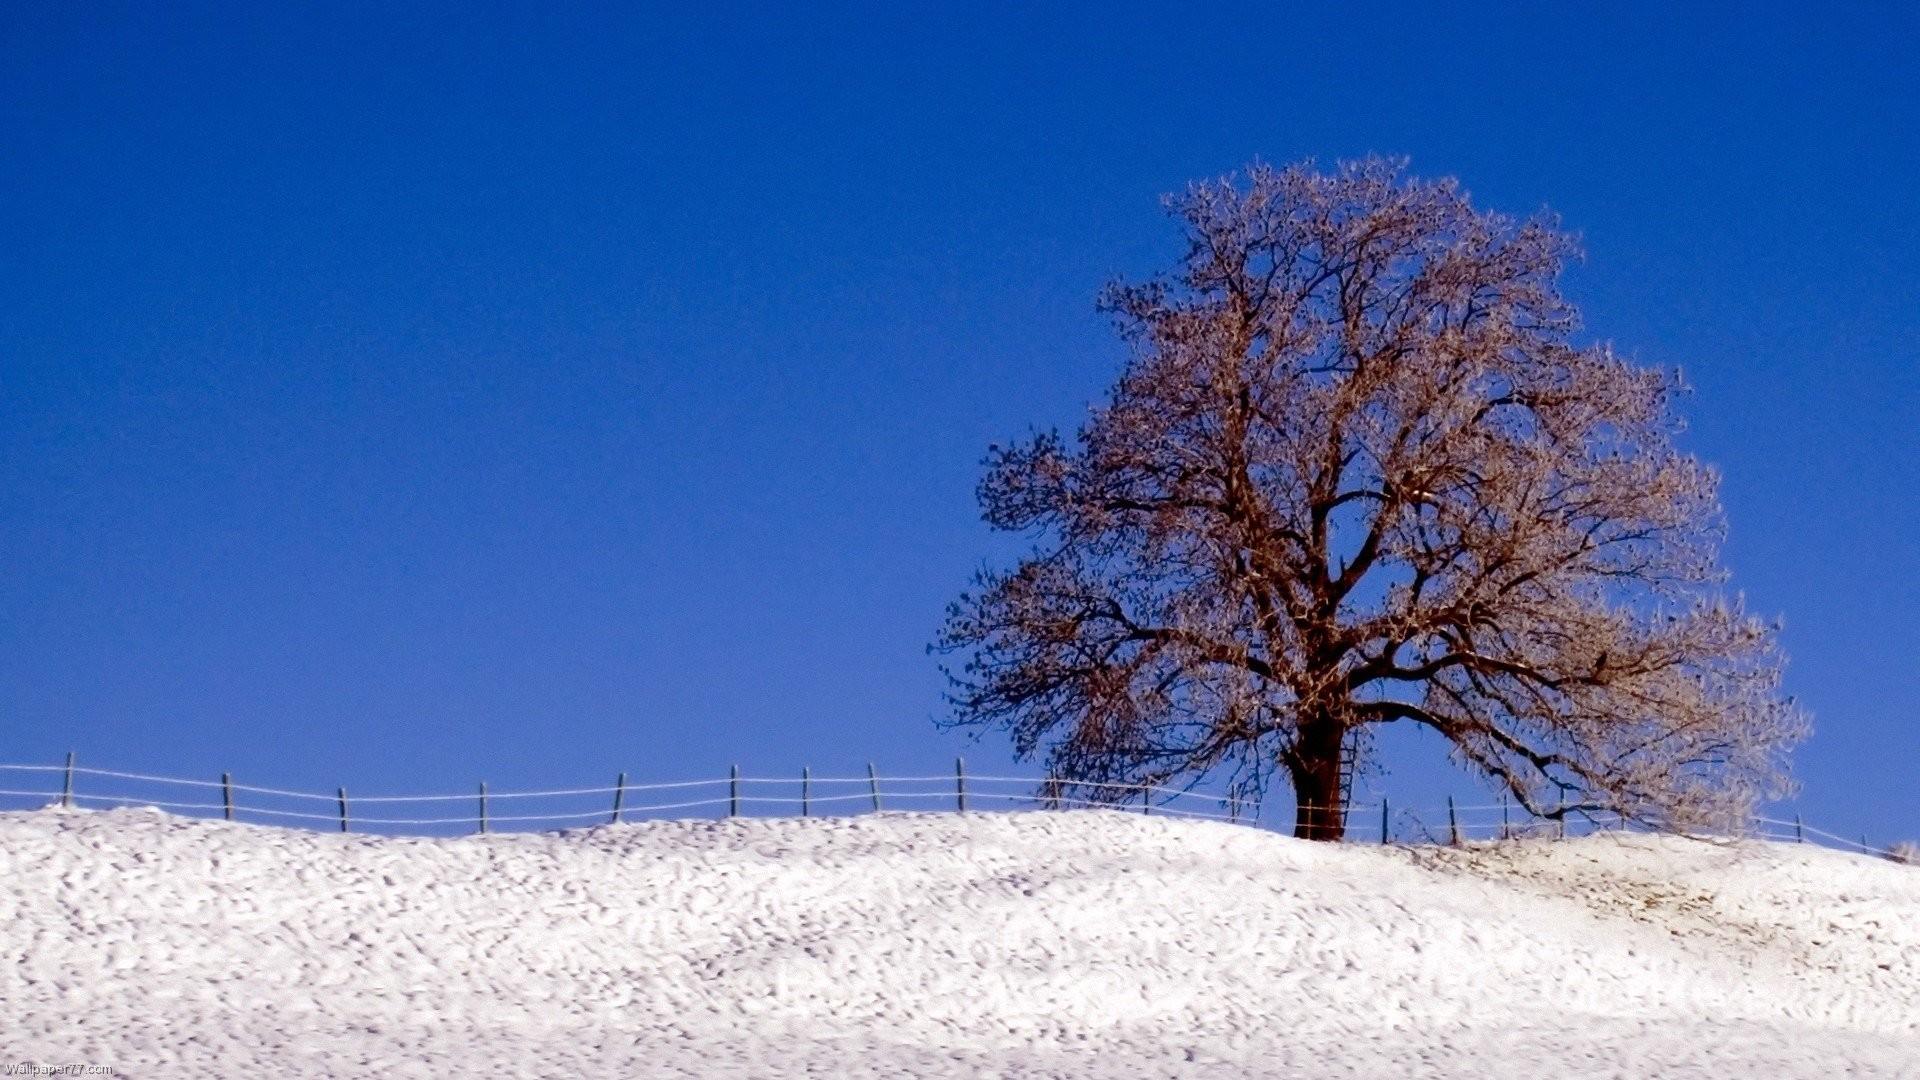 Winter Snow Scenes 432880 …